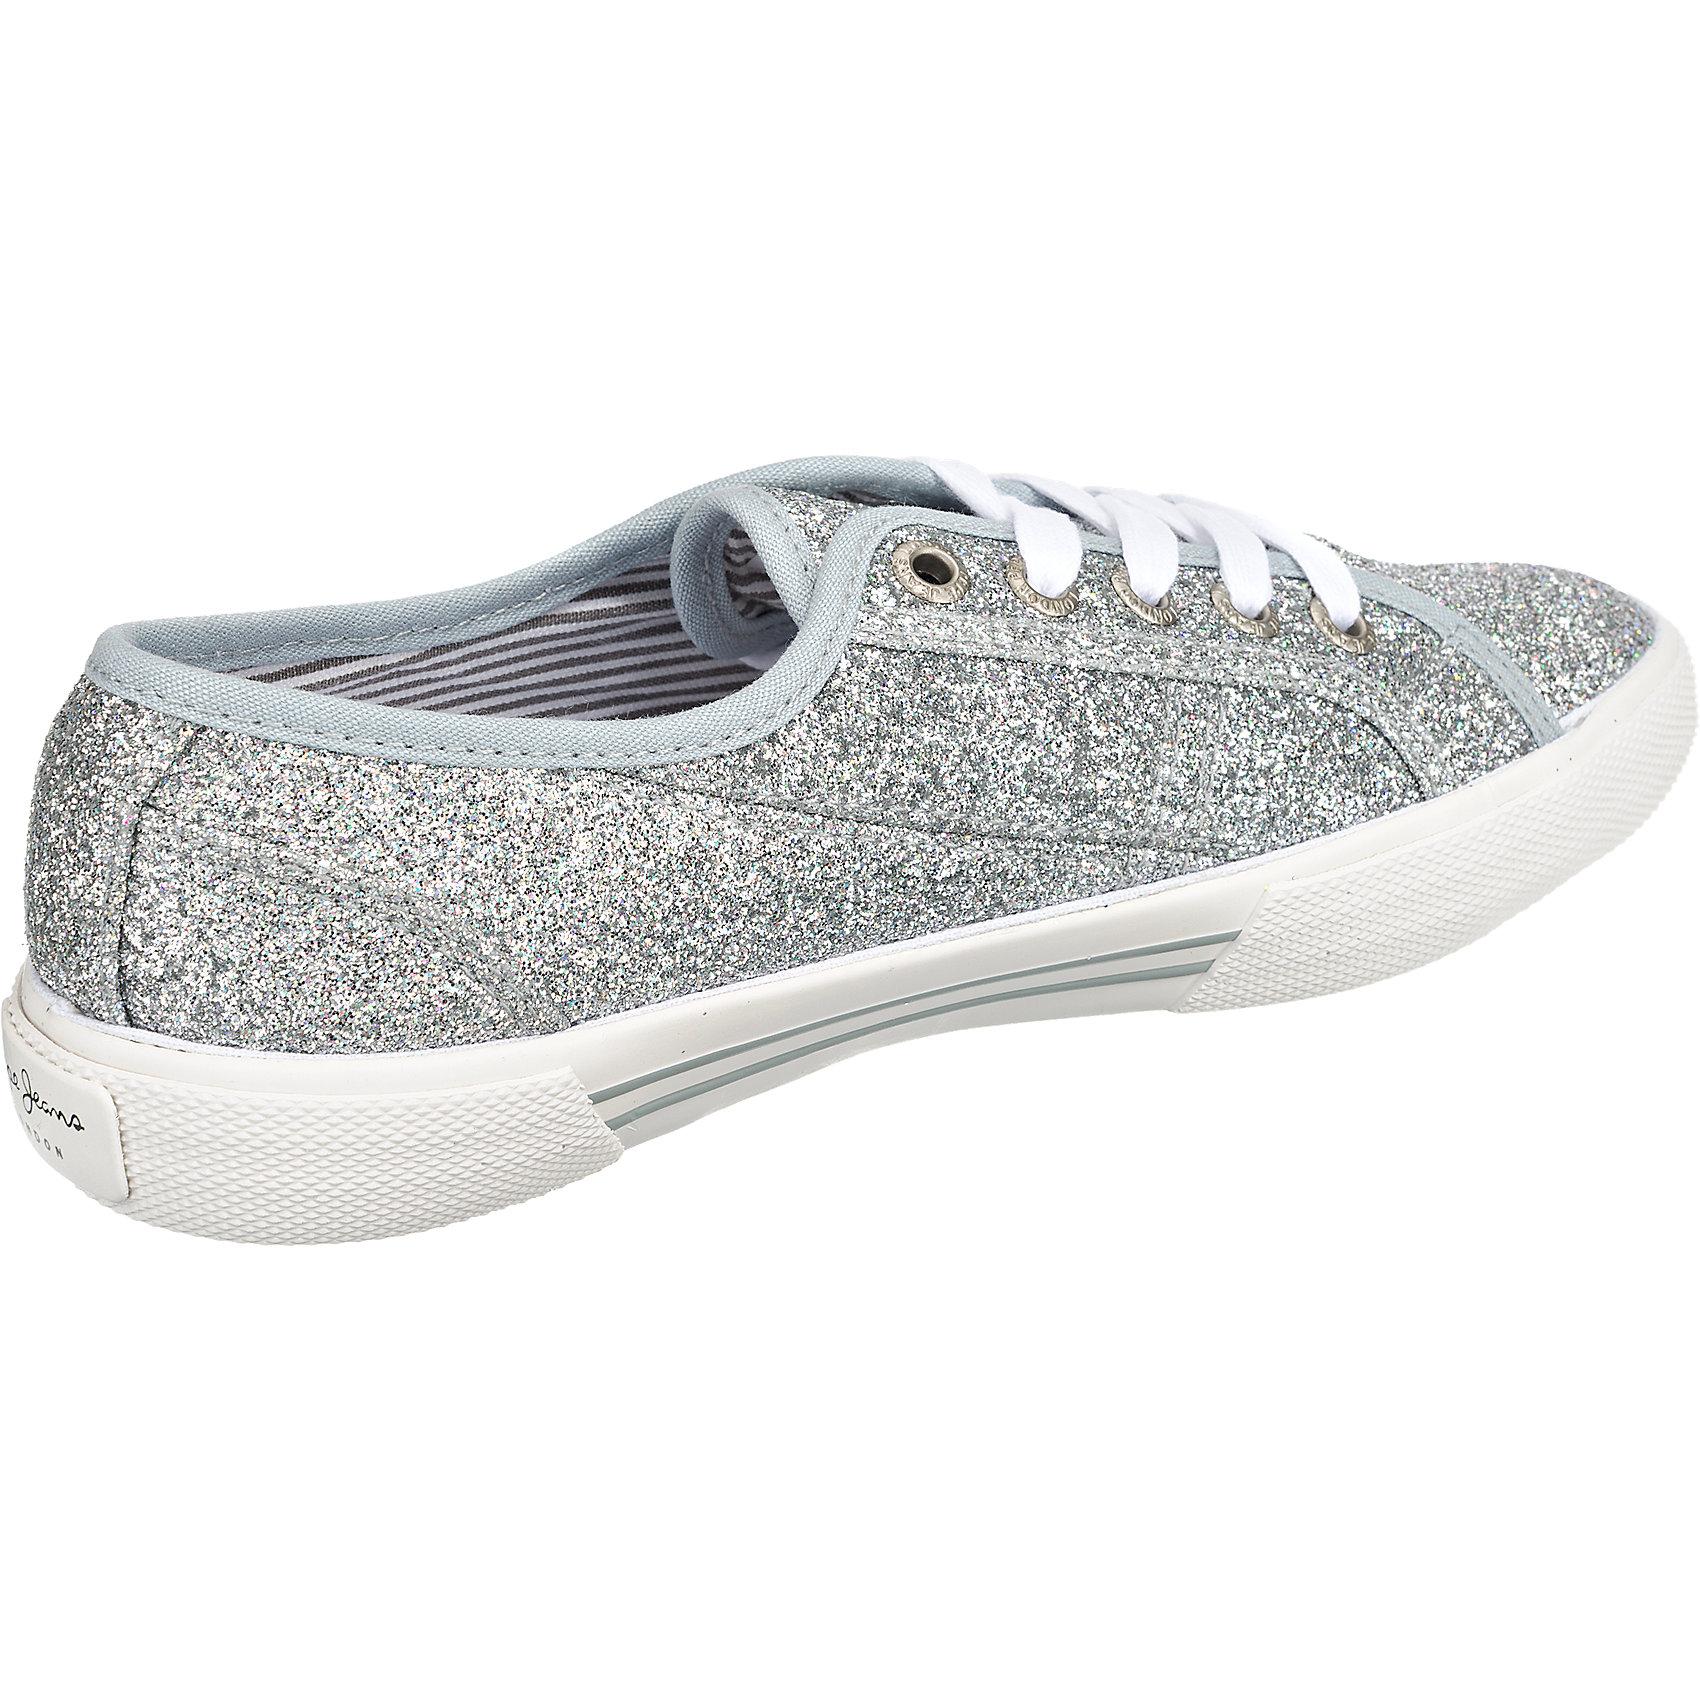 finest selection dfa67 0d292 Details zu Neu Pepe Jeans Aberlady Flash Sneakers silber gold 5769757